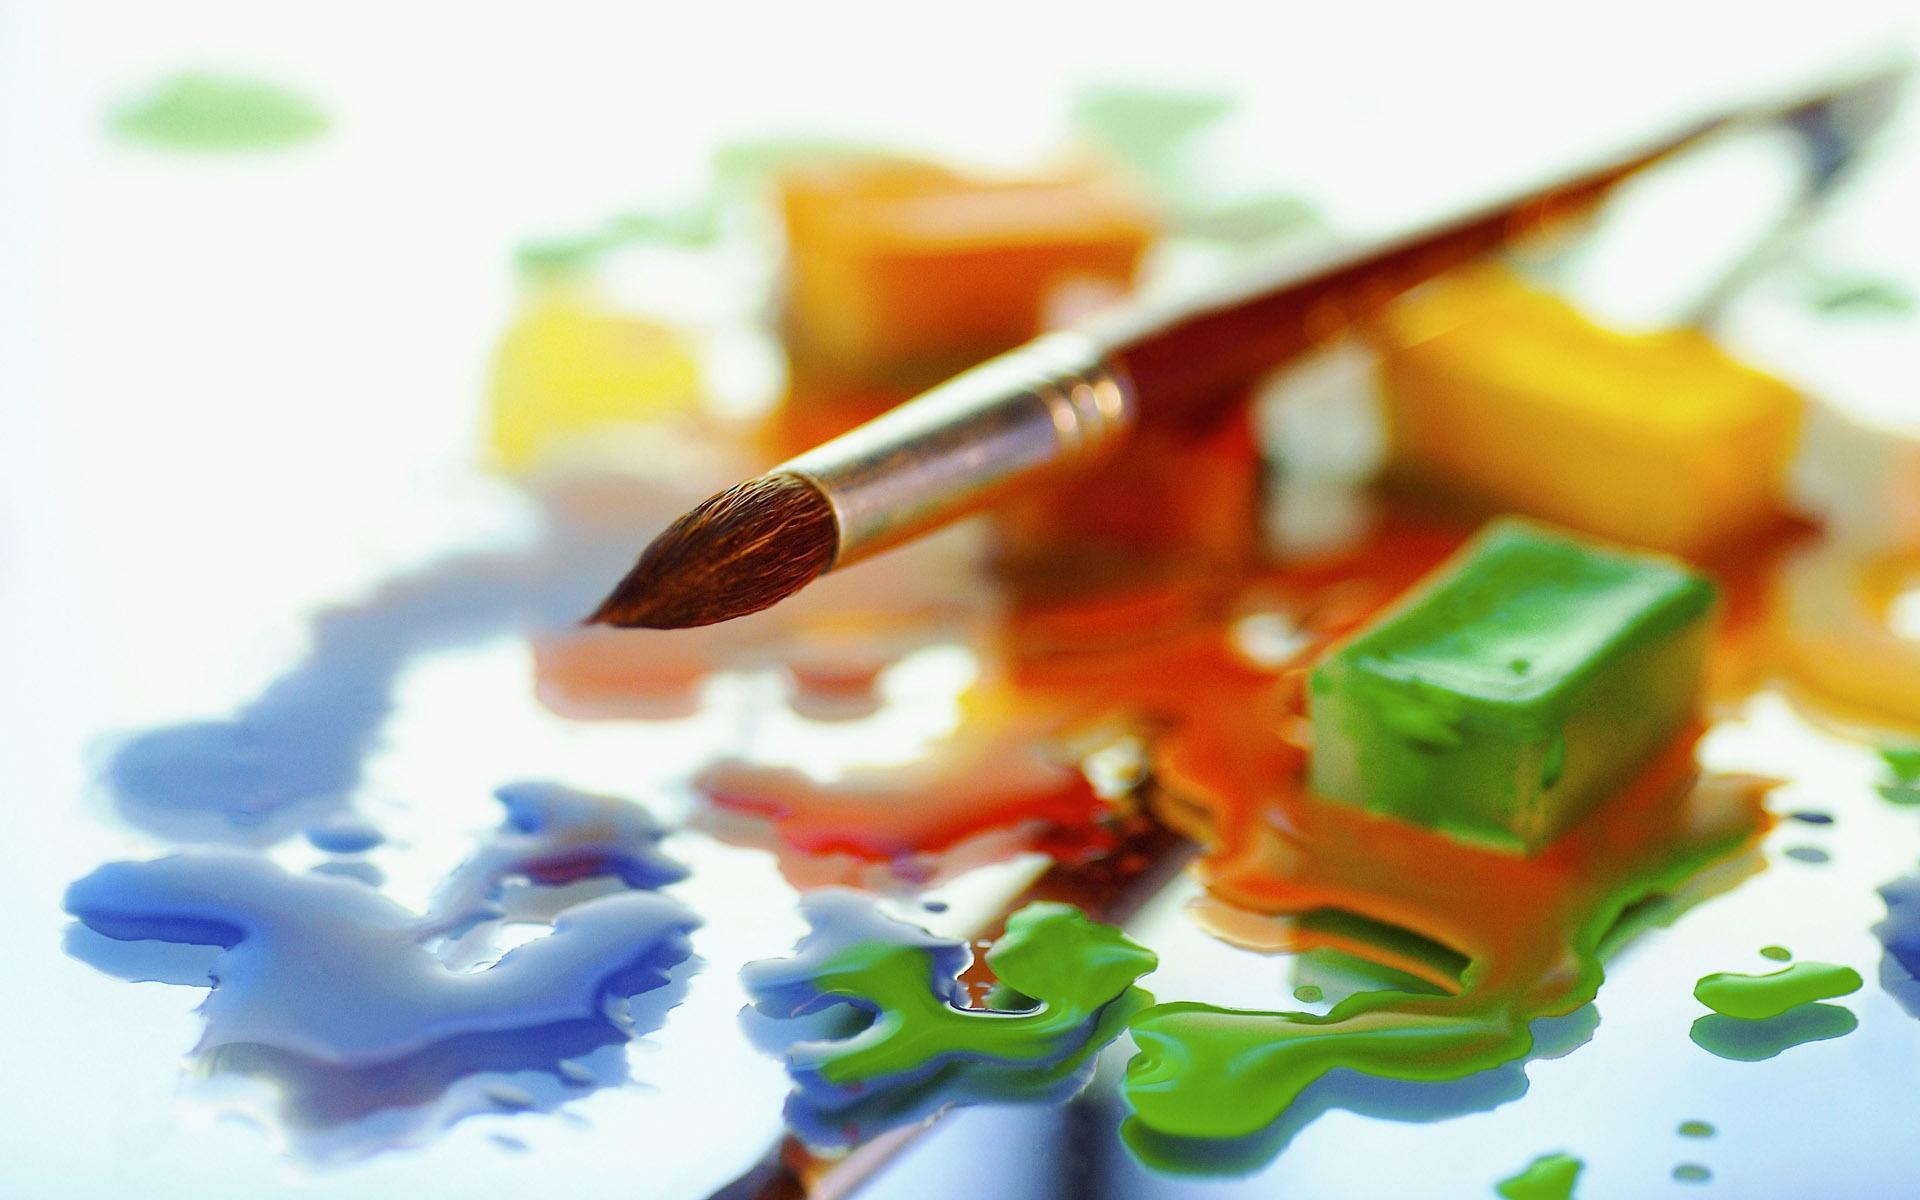 cool paint brush wallpaper 40575